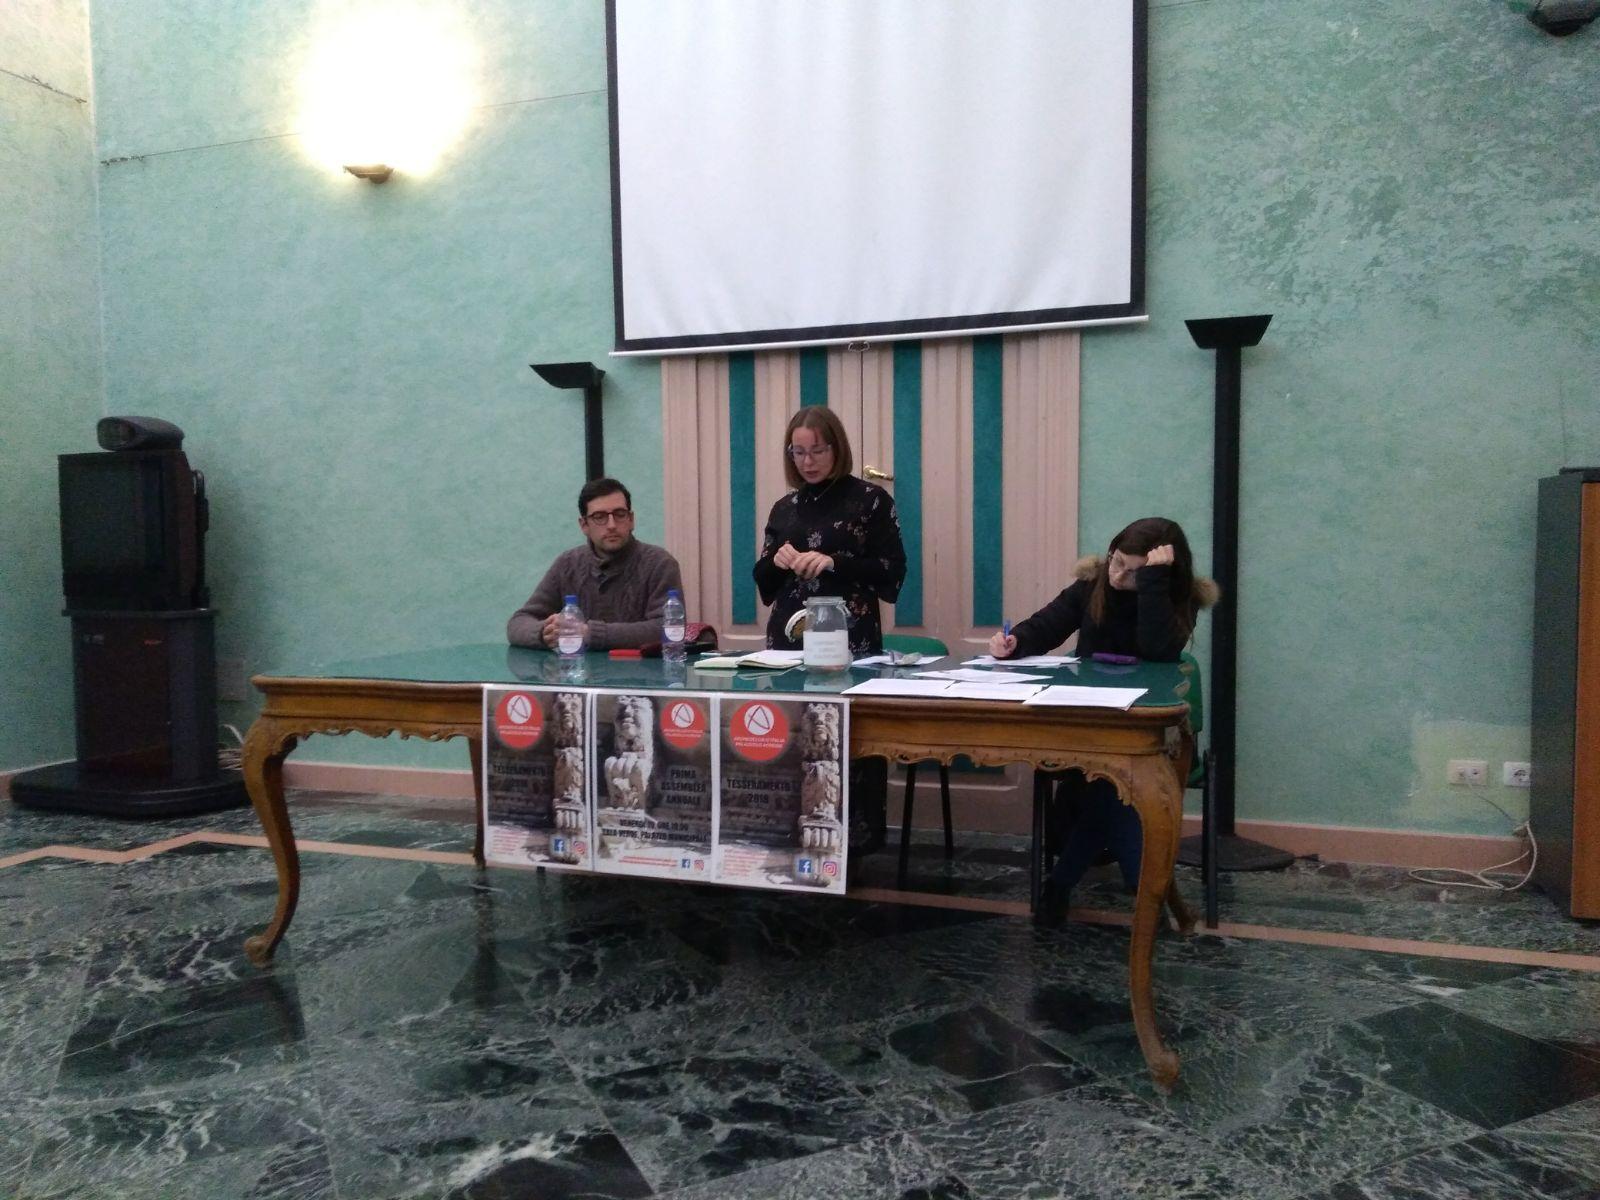 L'assemblea di Archeoclub a Palazzolo Acreide